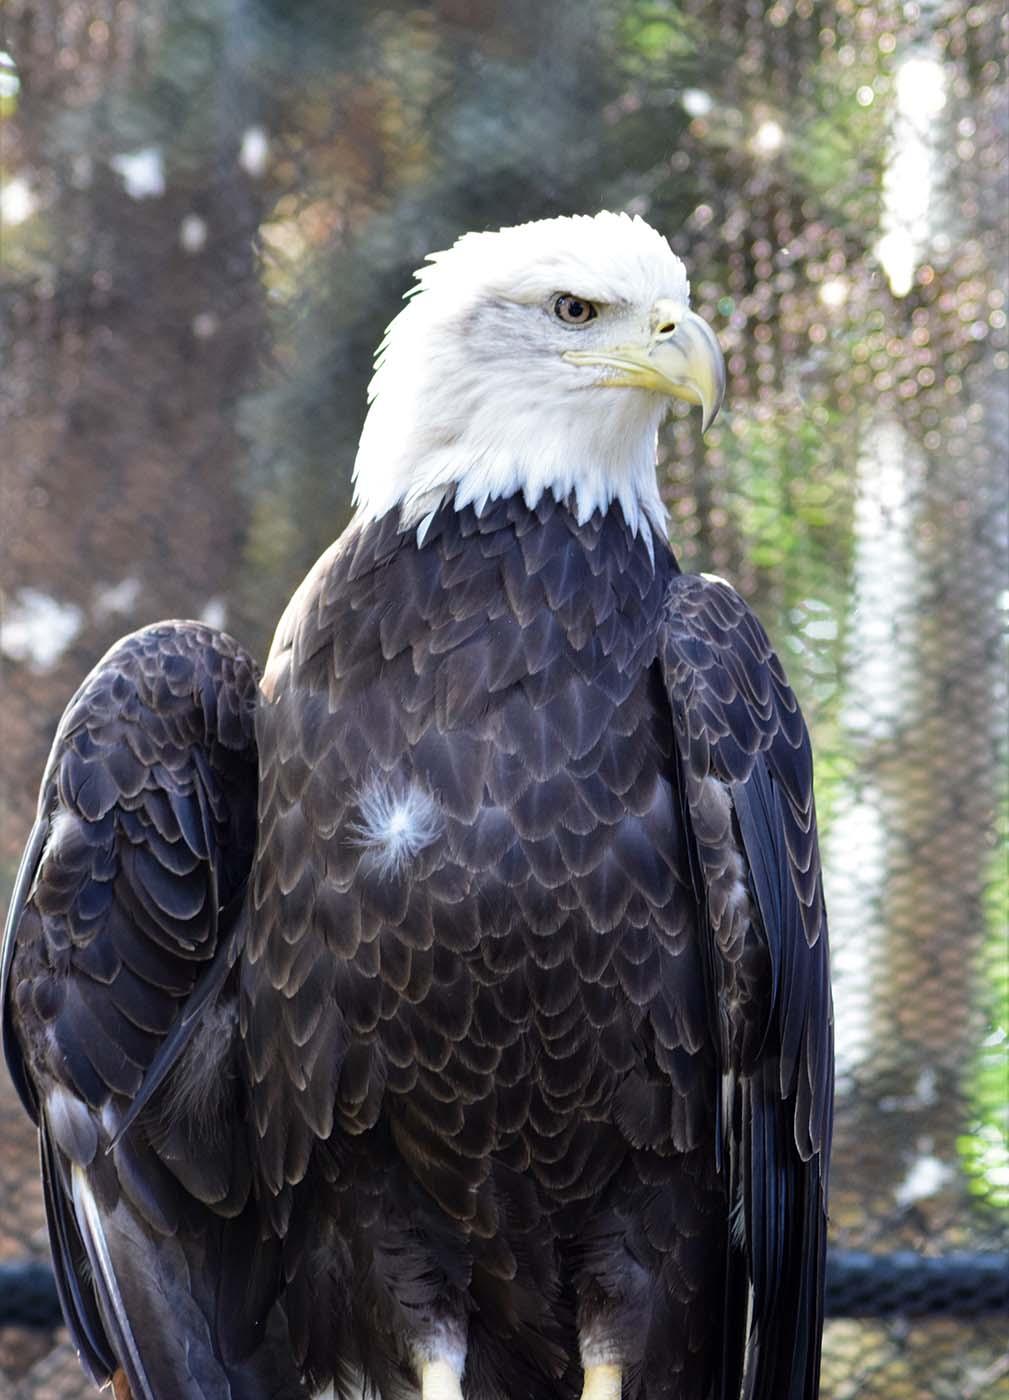 Draper Museum Raptor Experience: Jade the bald eagle